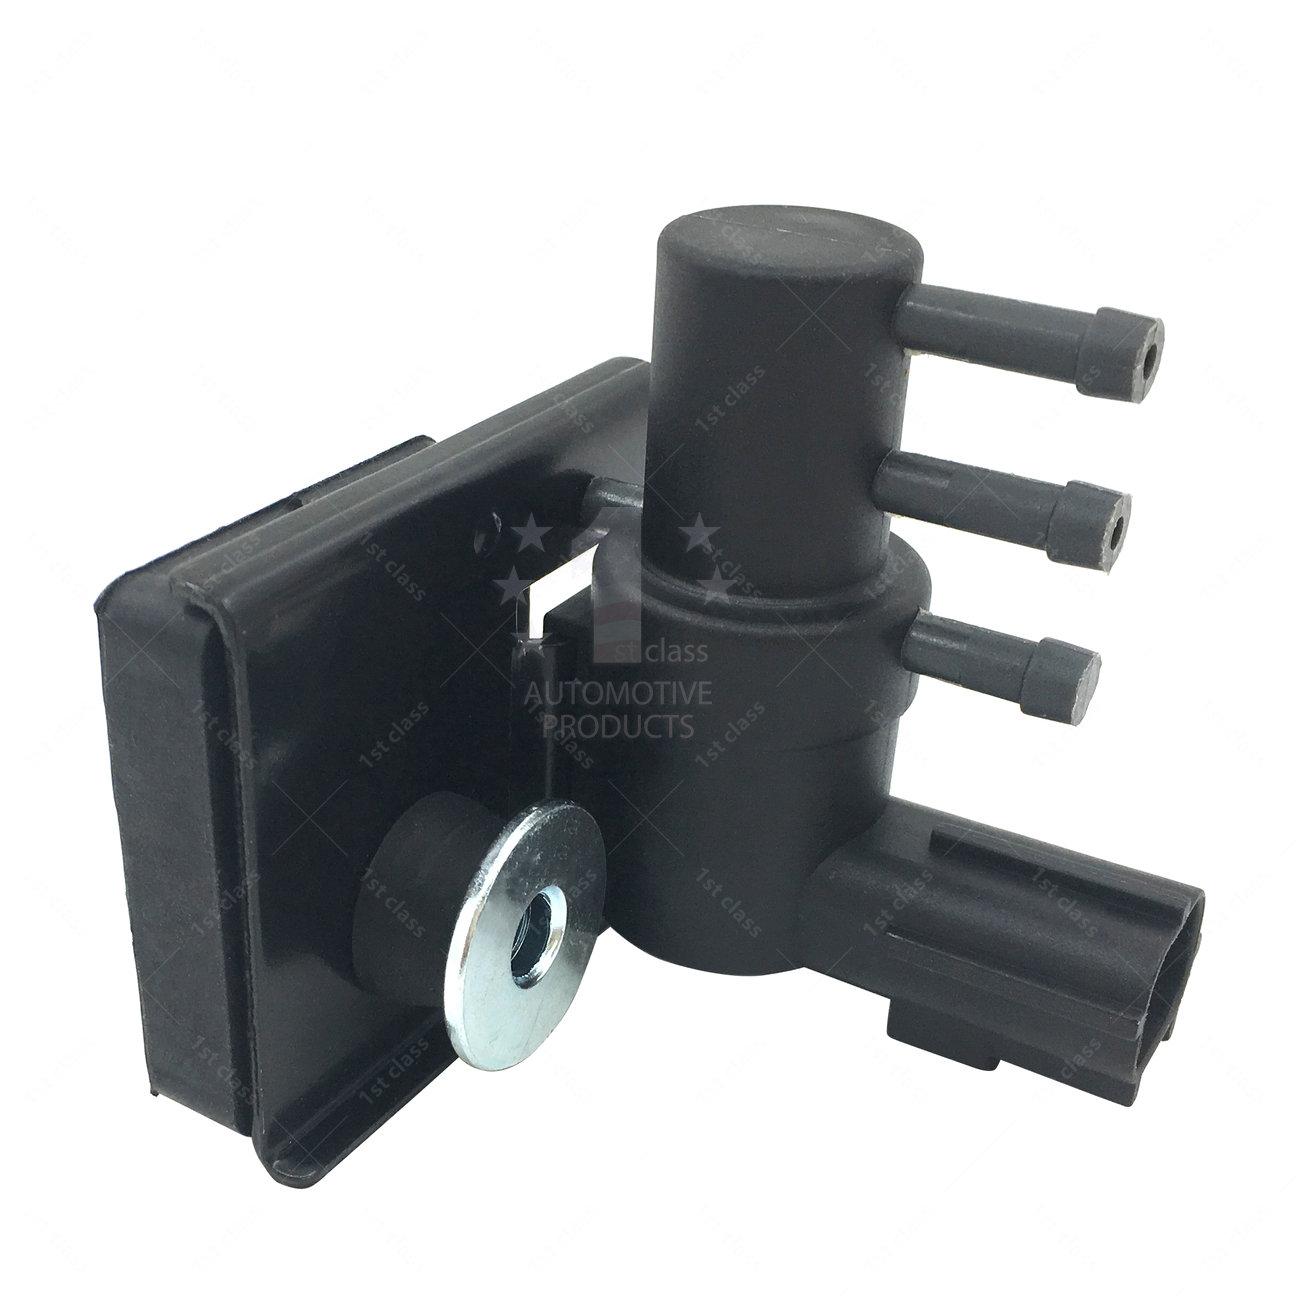 PitVisit Universal Anodized Aluminum Spark Plug Wire Separator Clamp 8mm 9mm 10mm Diameter Blue